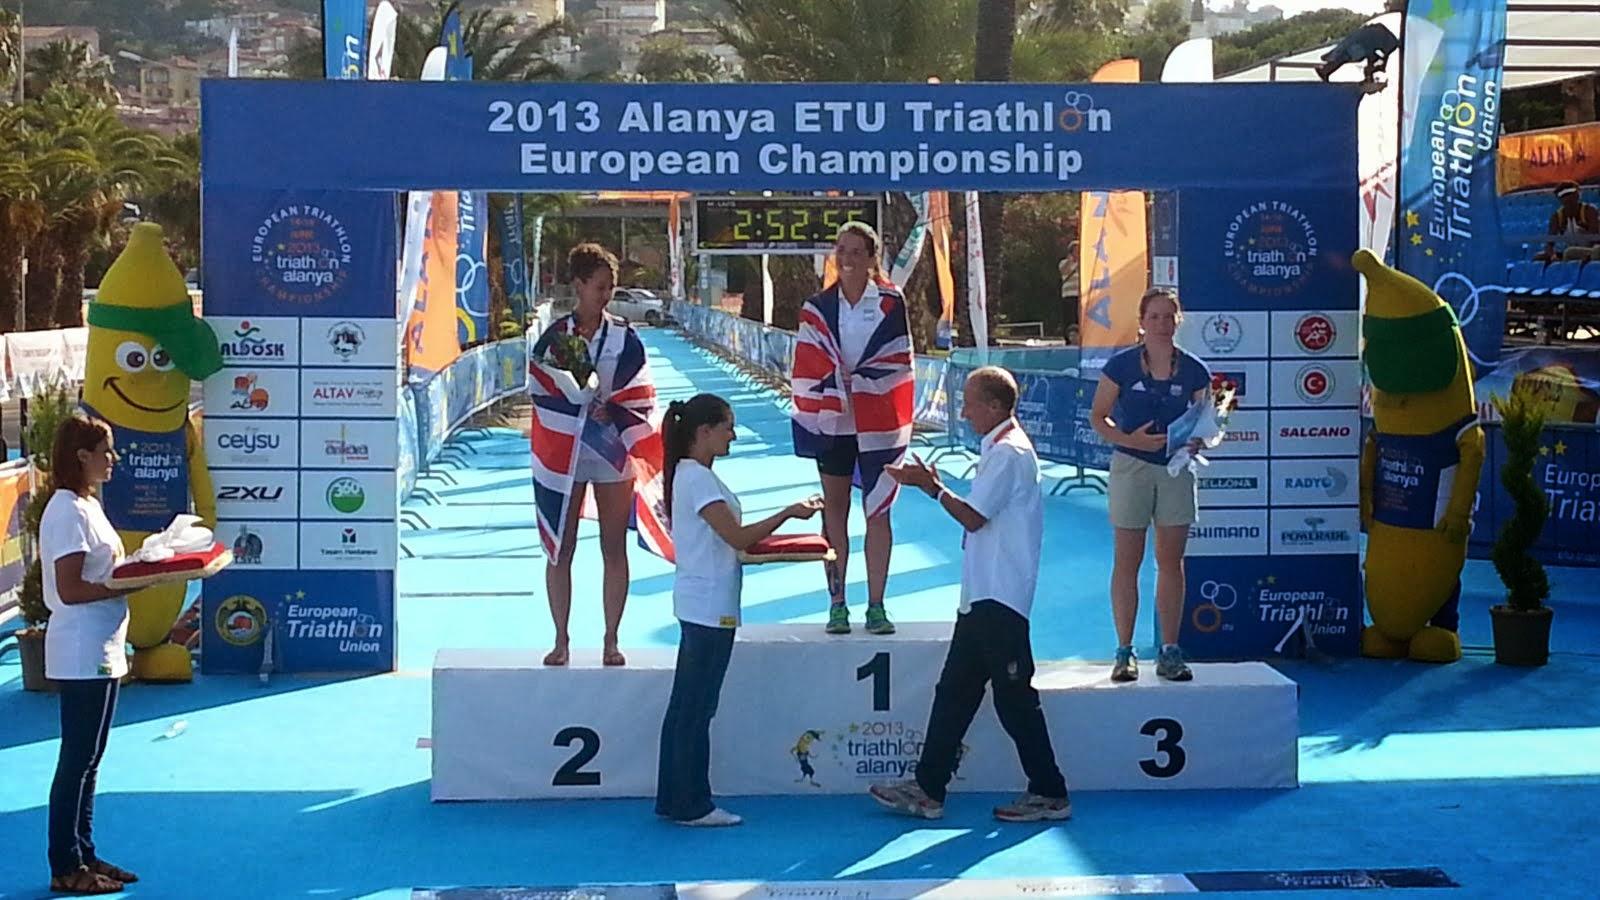 2013 European Champion